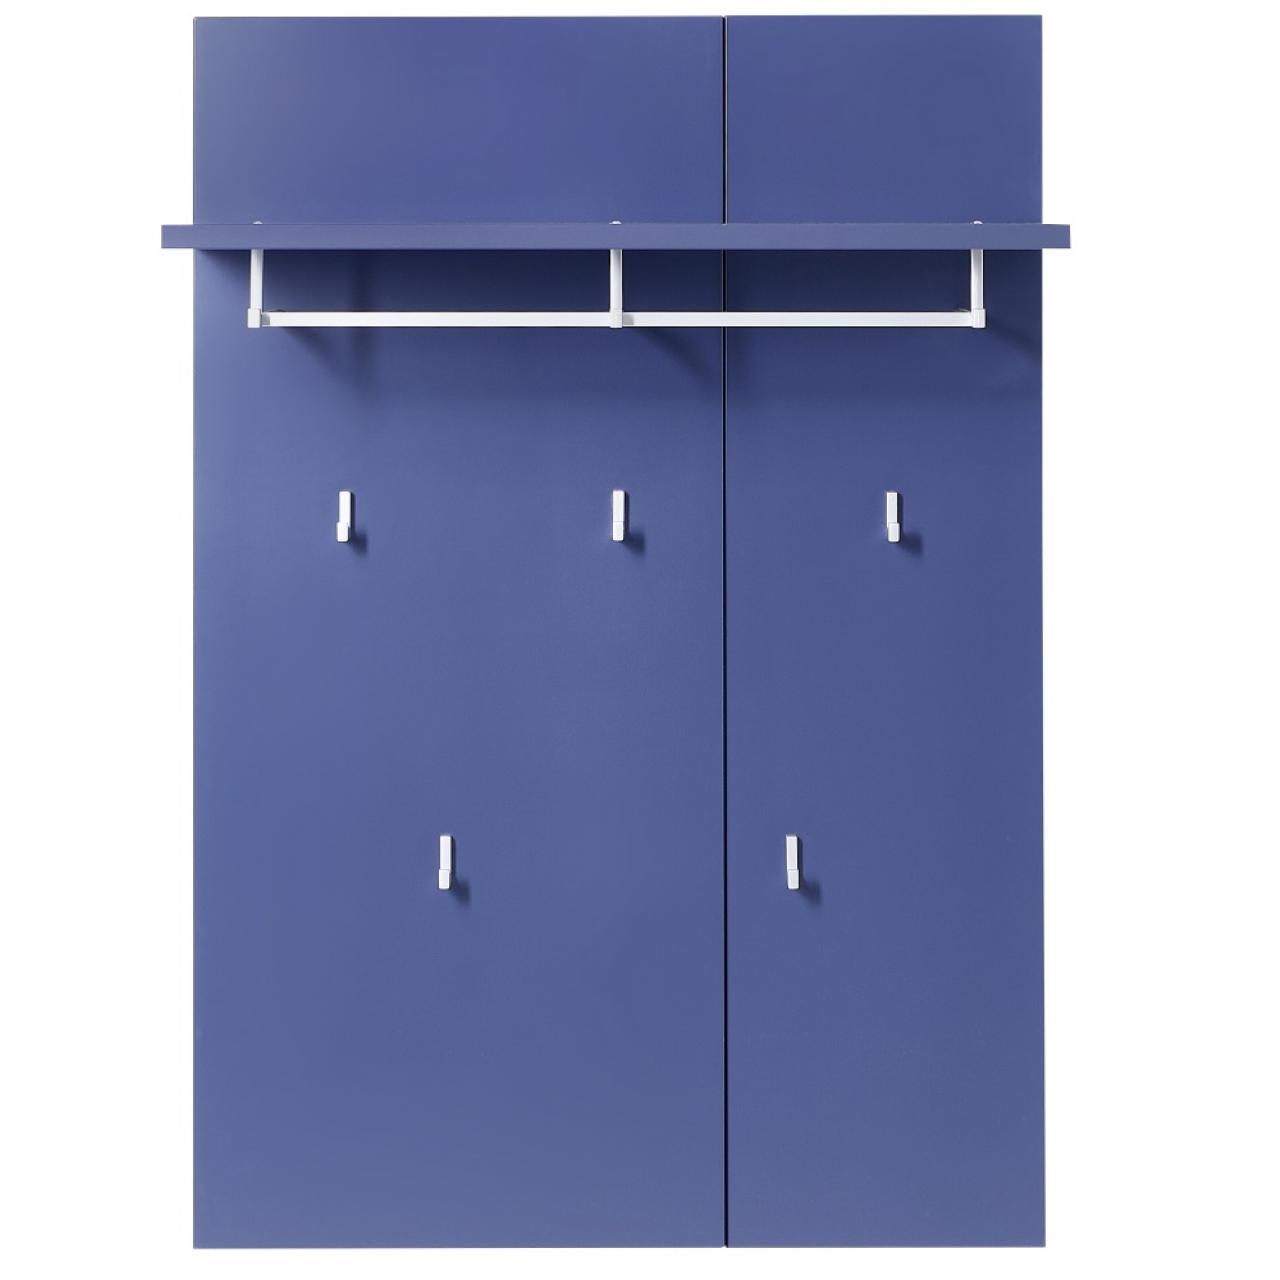 Garderobenpaneel K2 blau 5 Haken 1 Kleiderstange MDF Flur Diele Garderobe